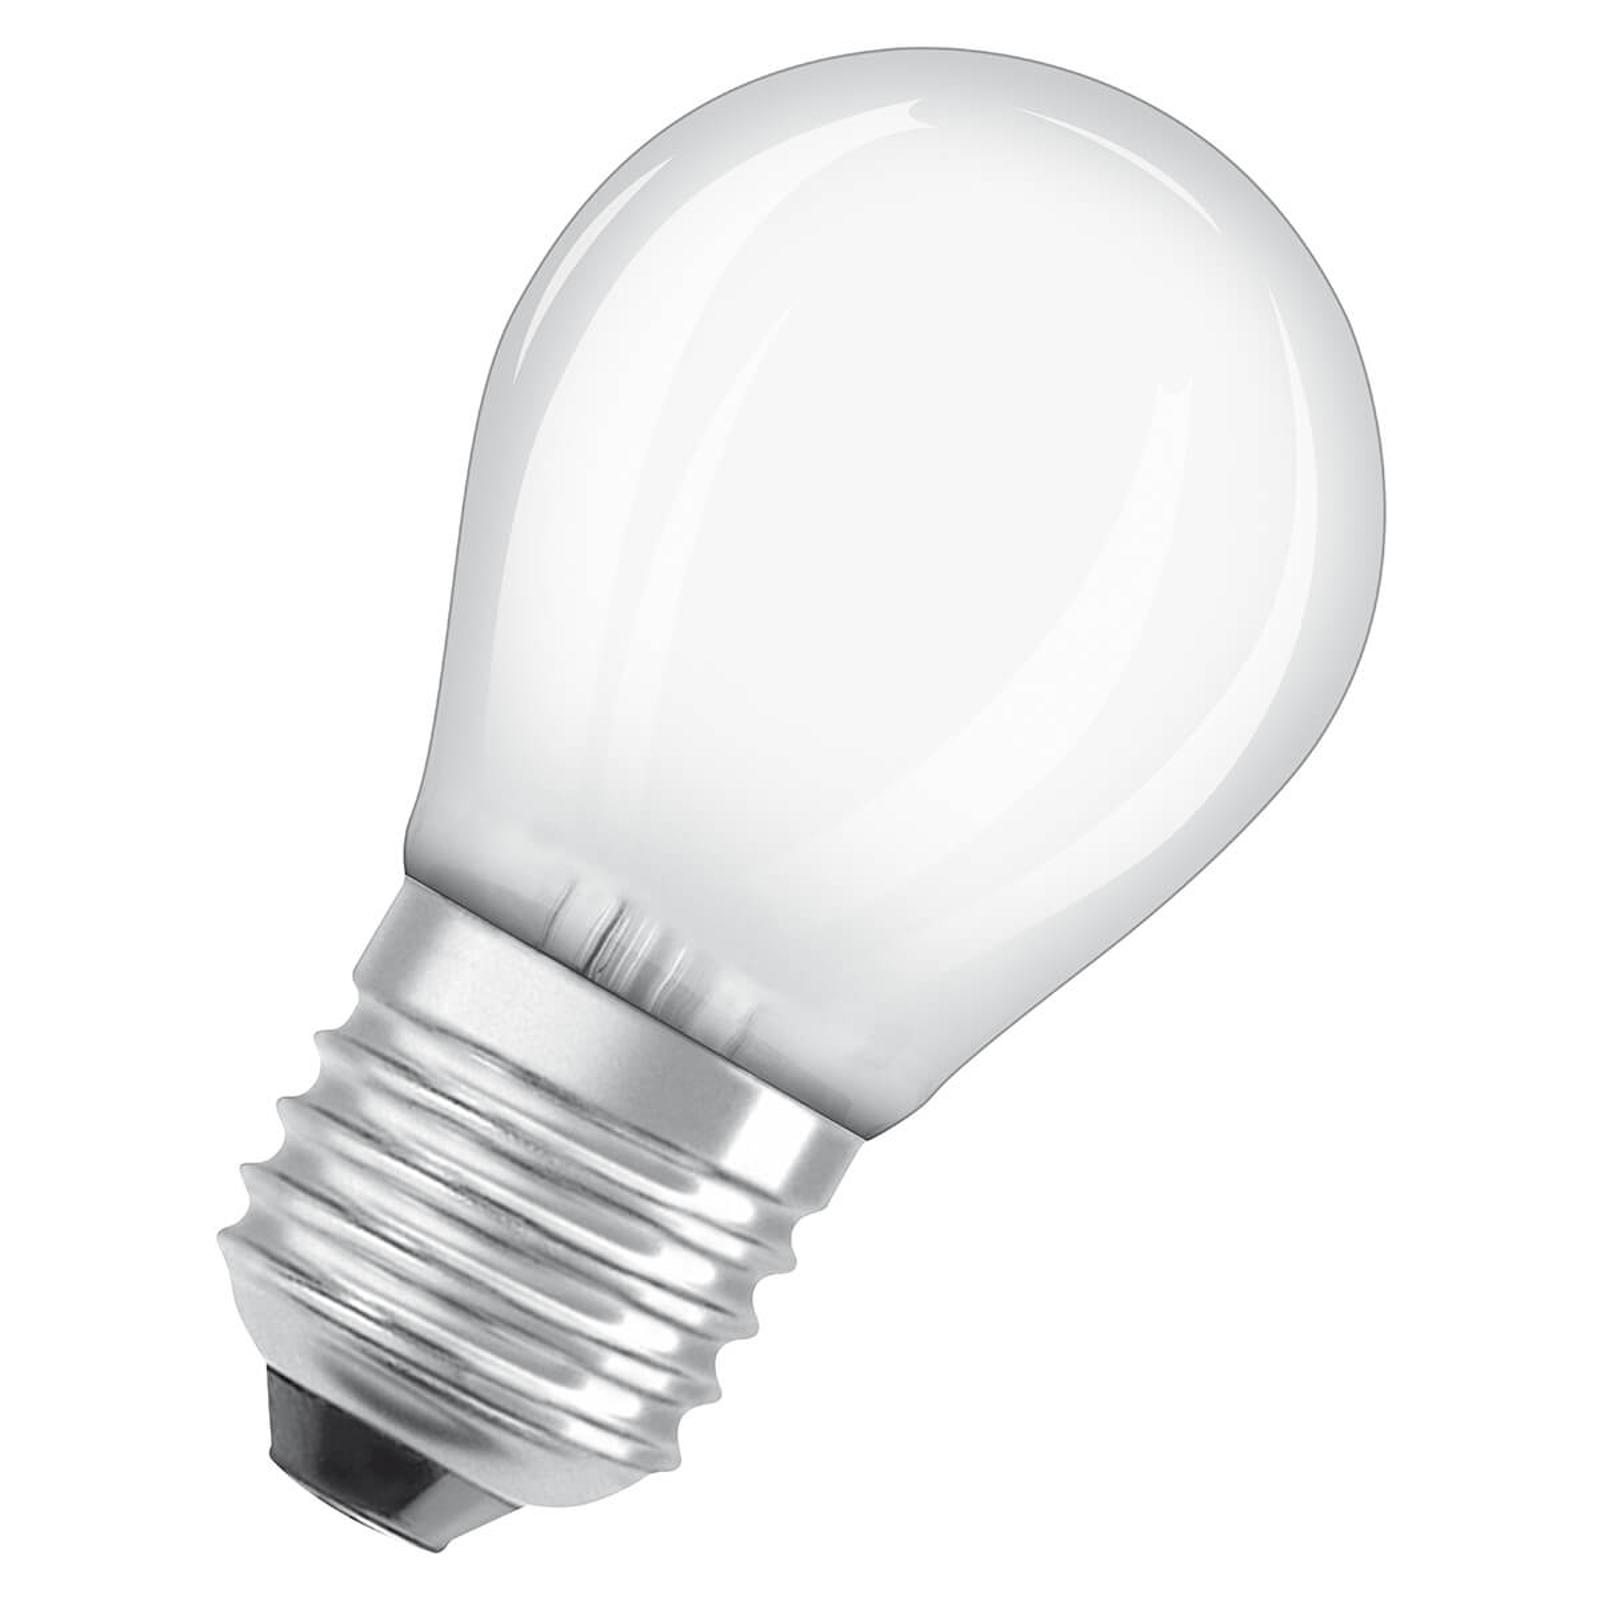 OSRAM LED-Tropfenlampe E27 2,8W 827 dimmbar